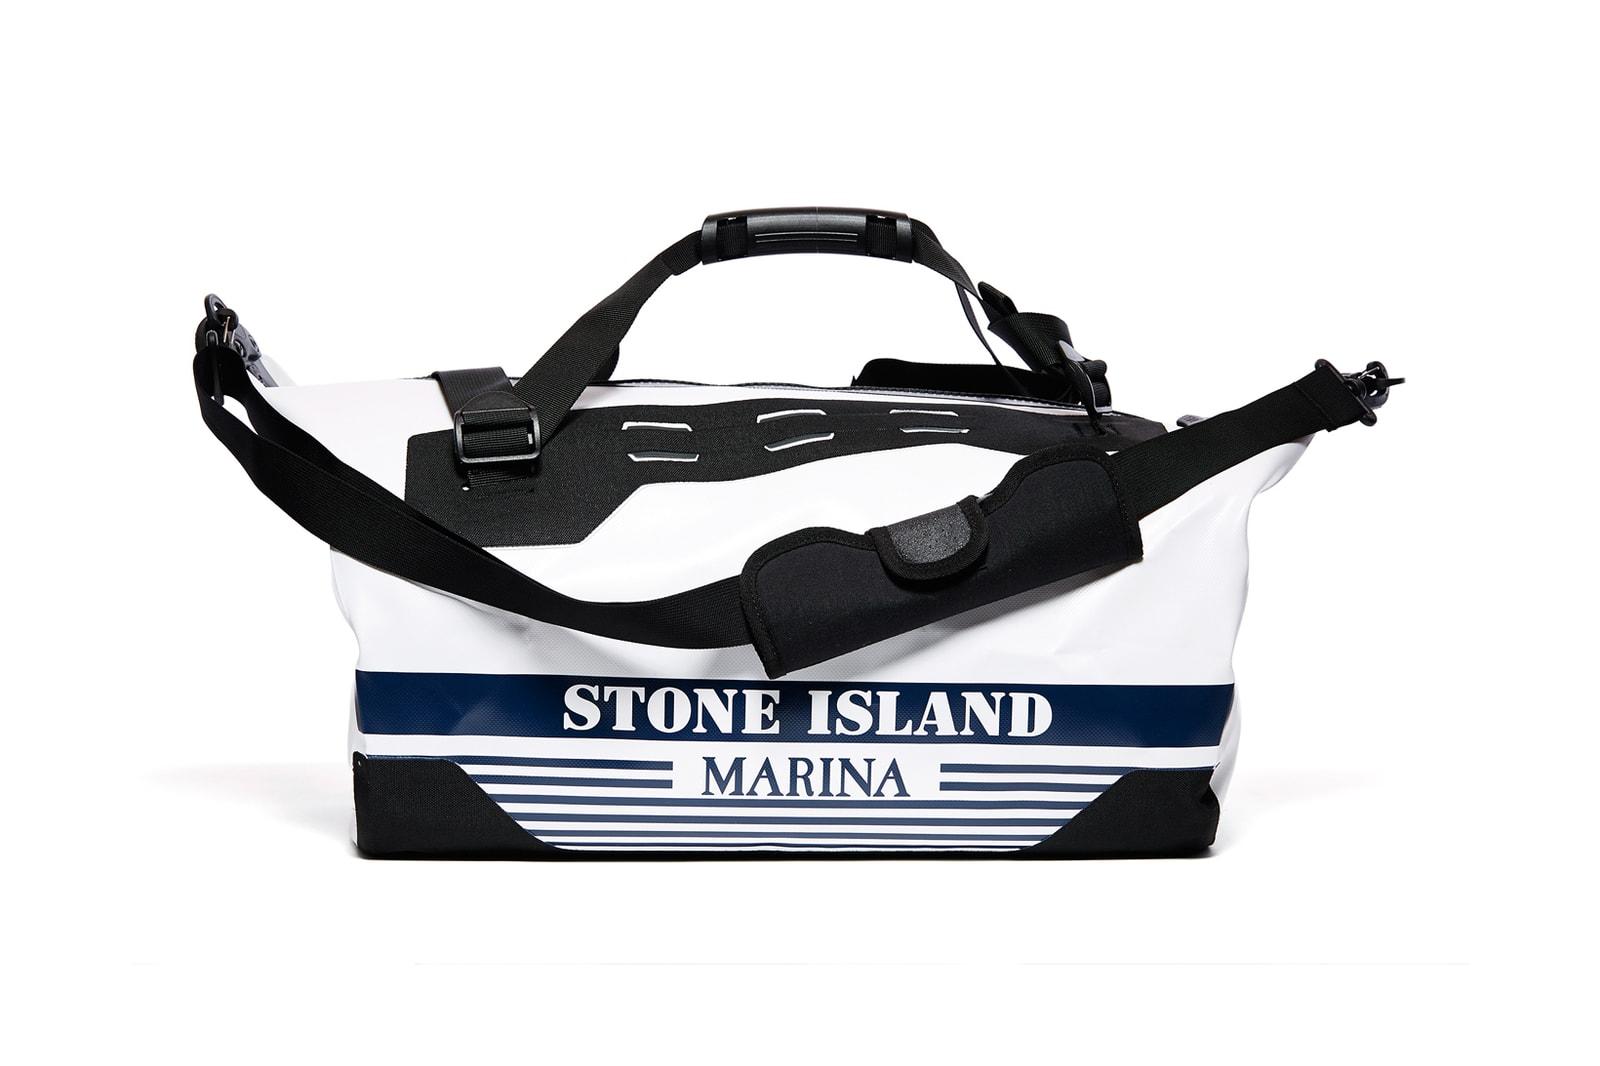 Stone Island Marina Kinfolk Editorial Clothing Apparel Accessories